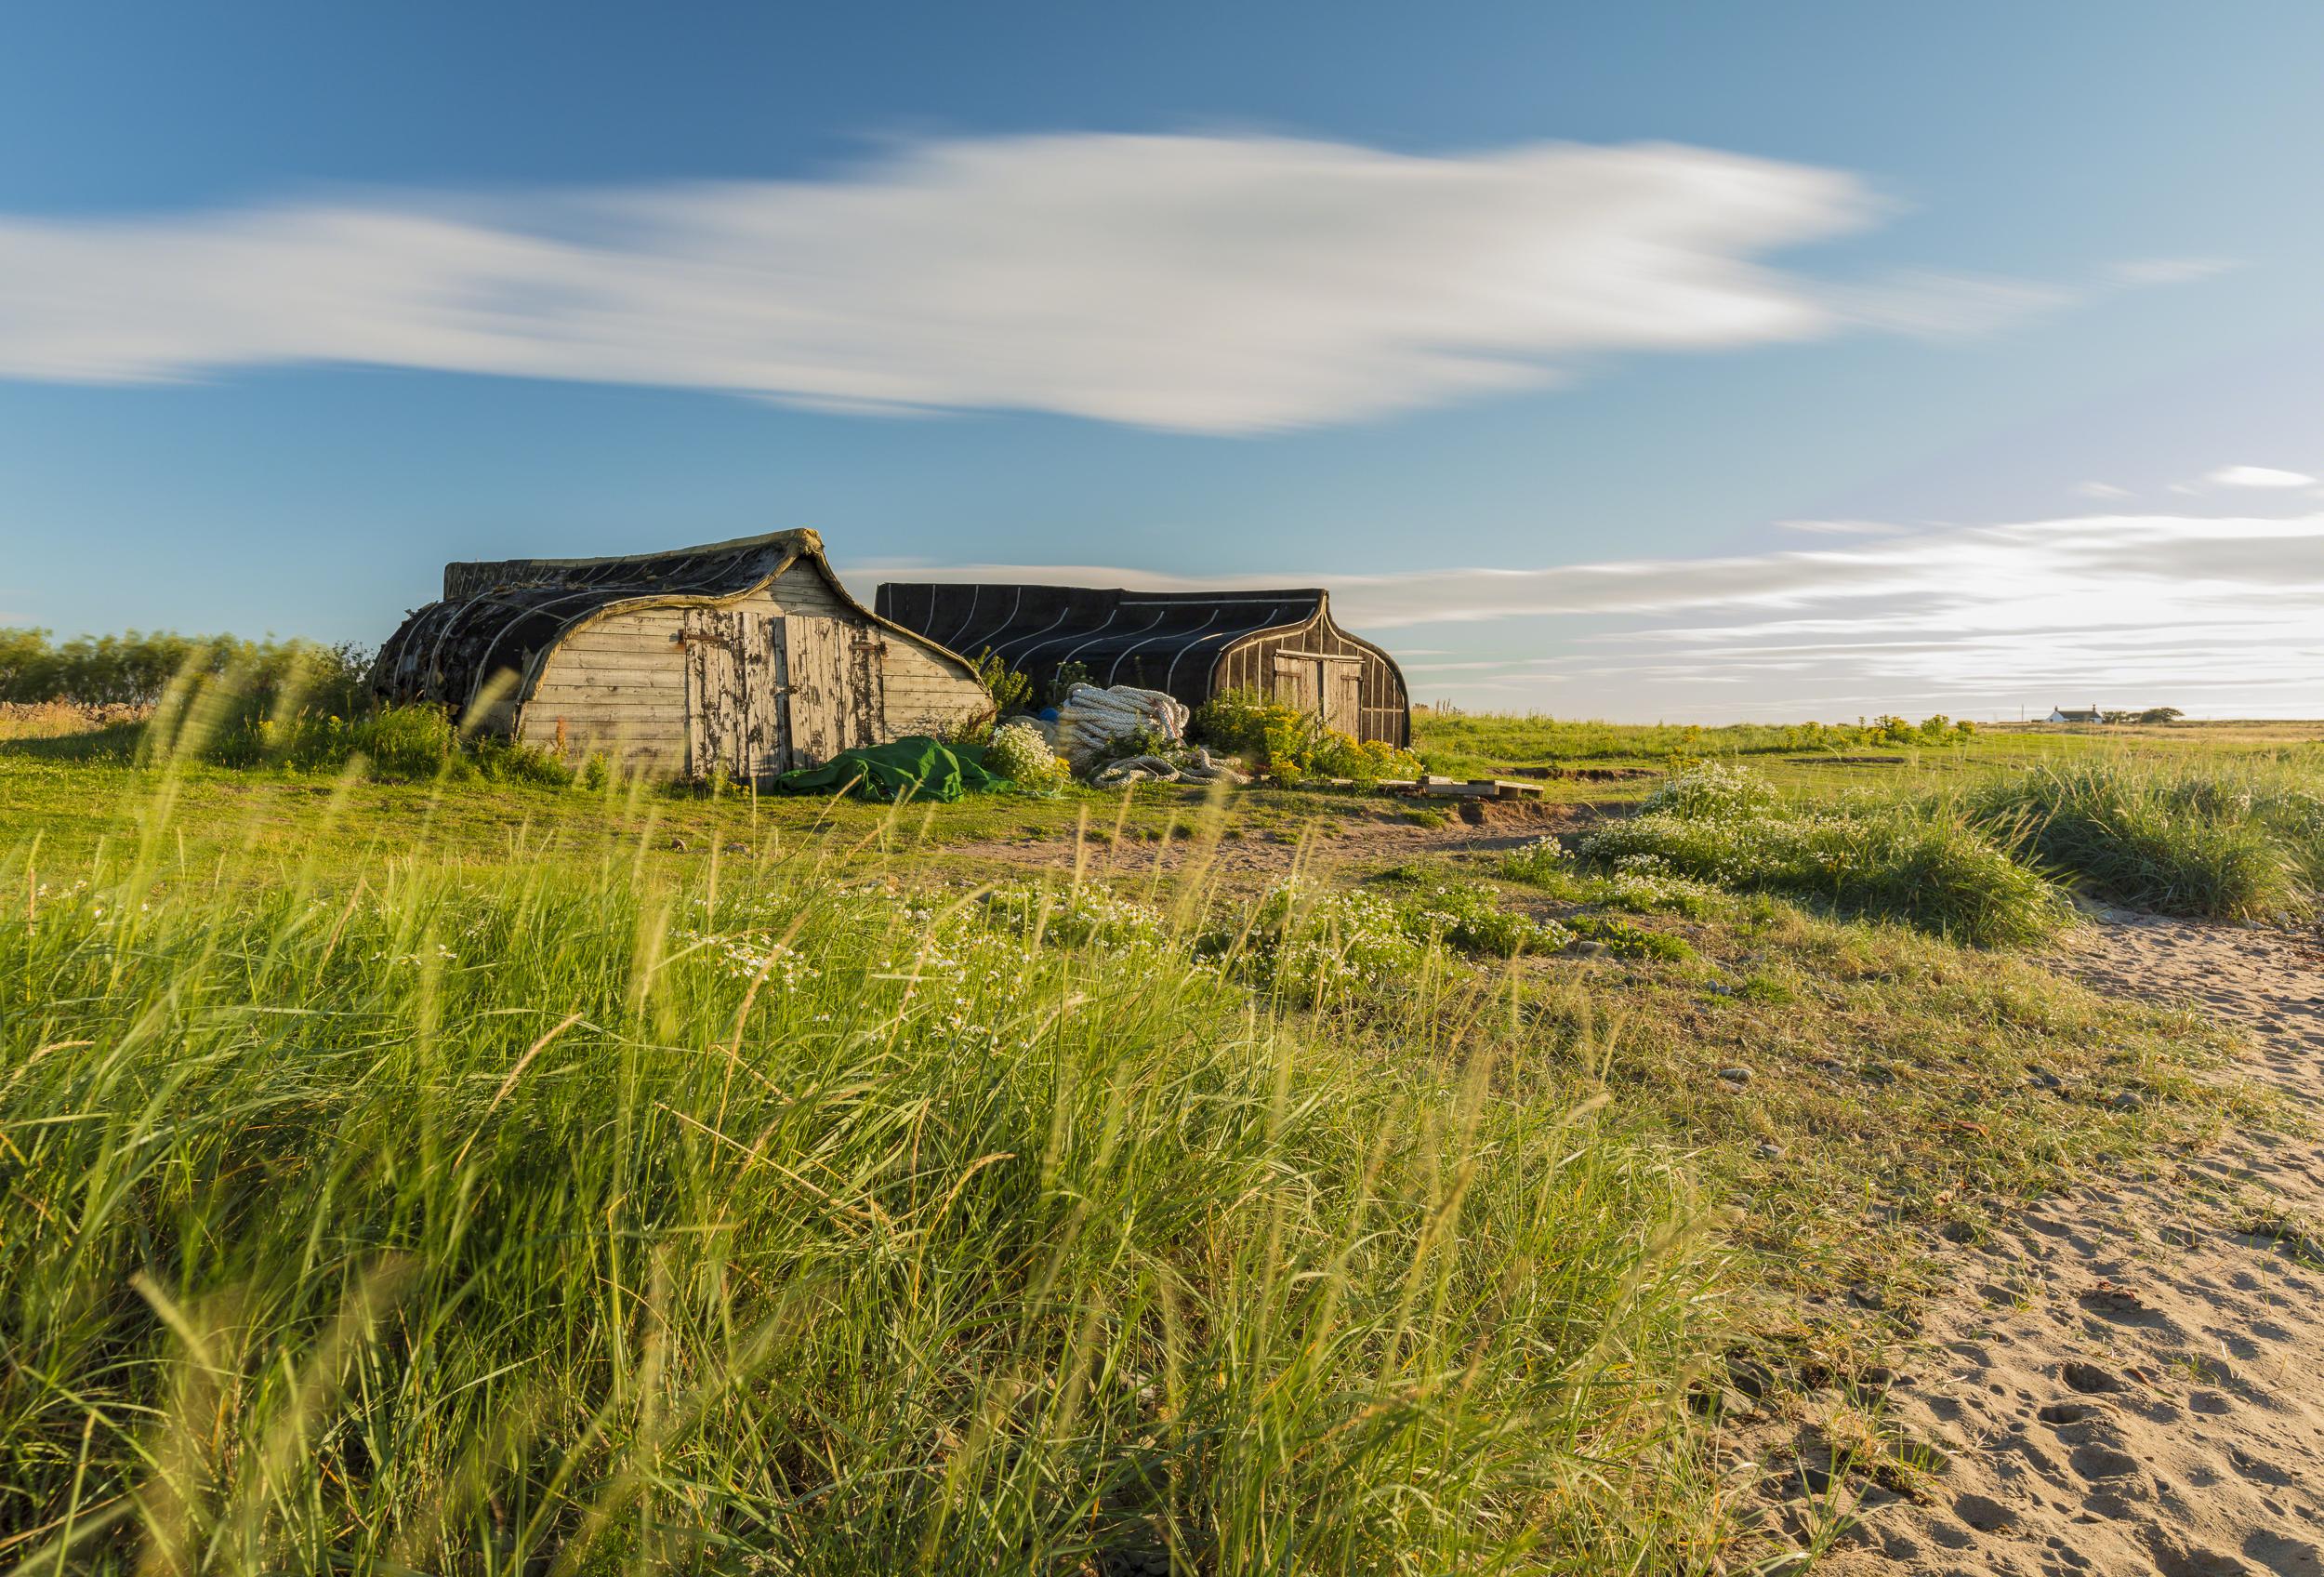 Upturned Boat Yards - Holy Island 06:49 29th July 2017